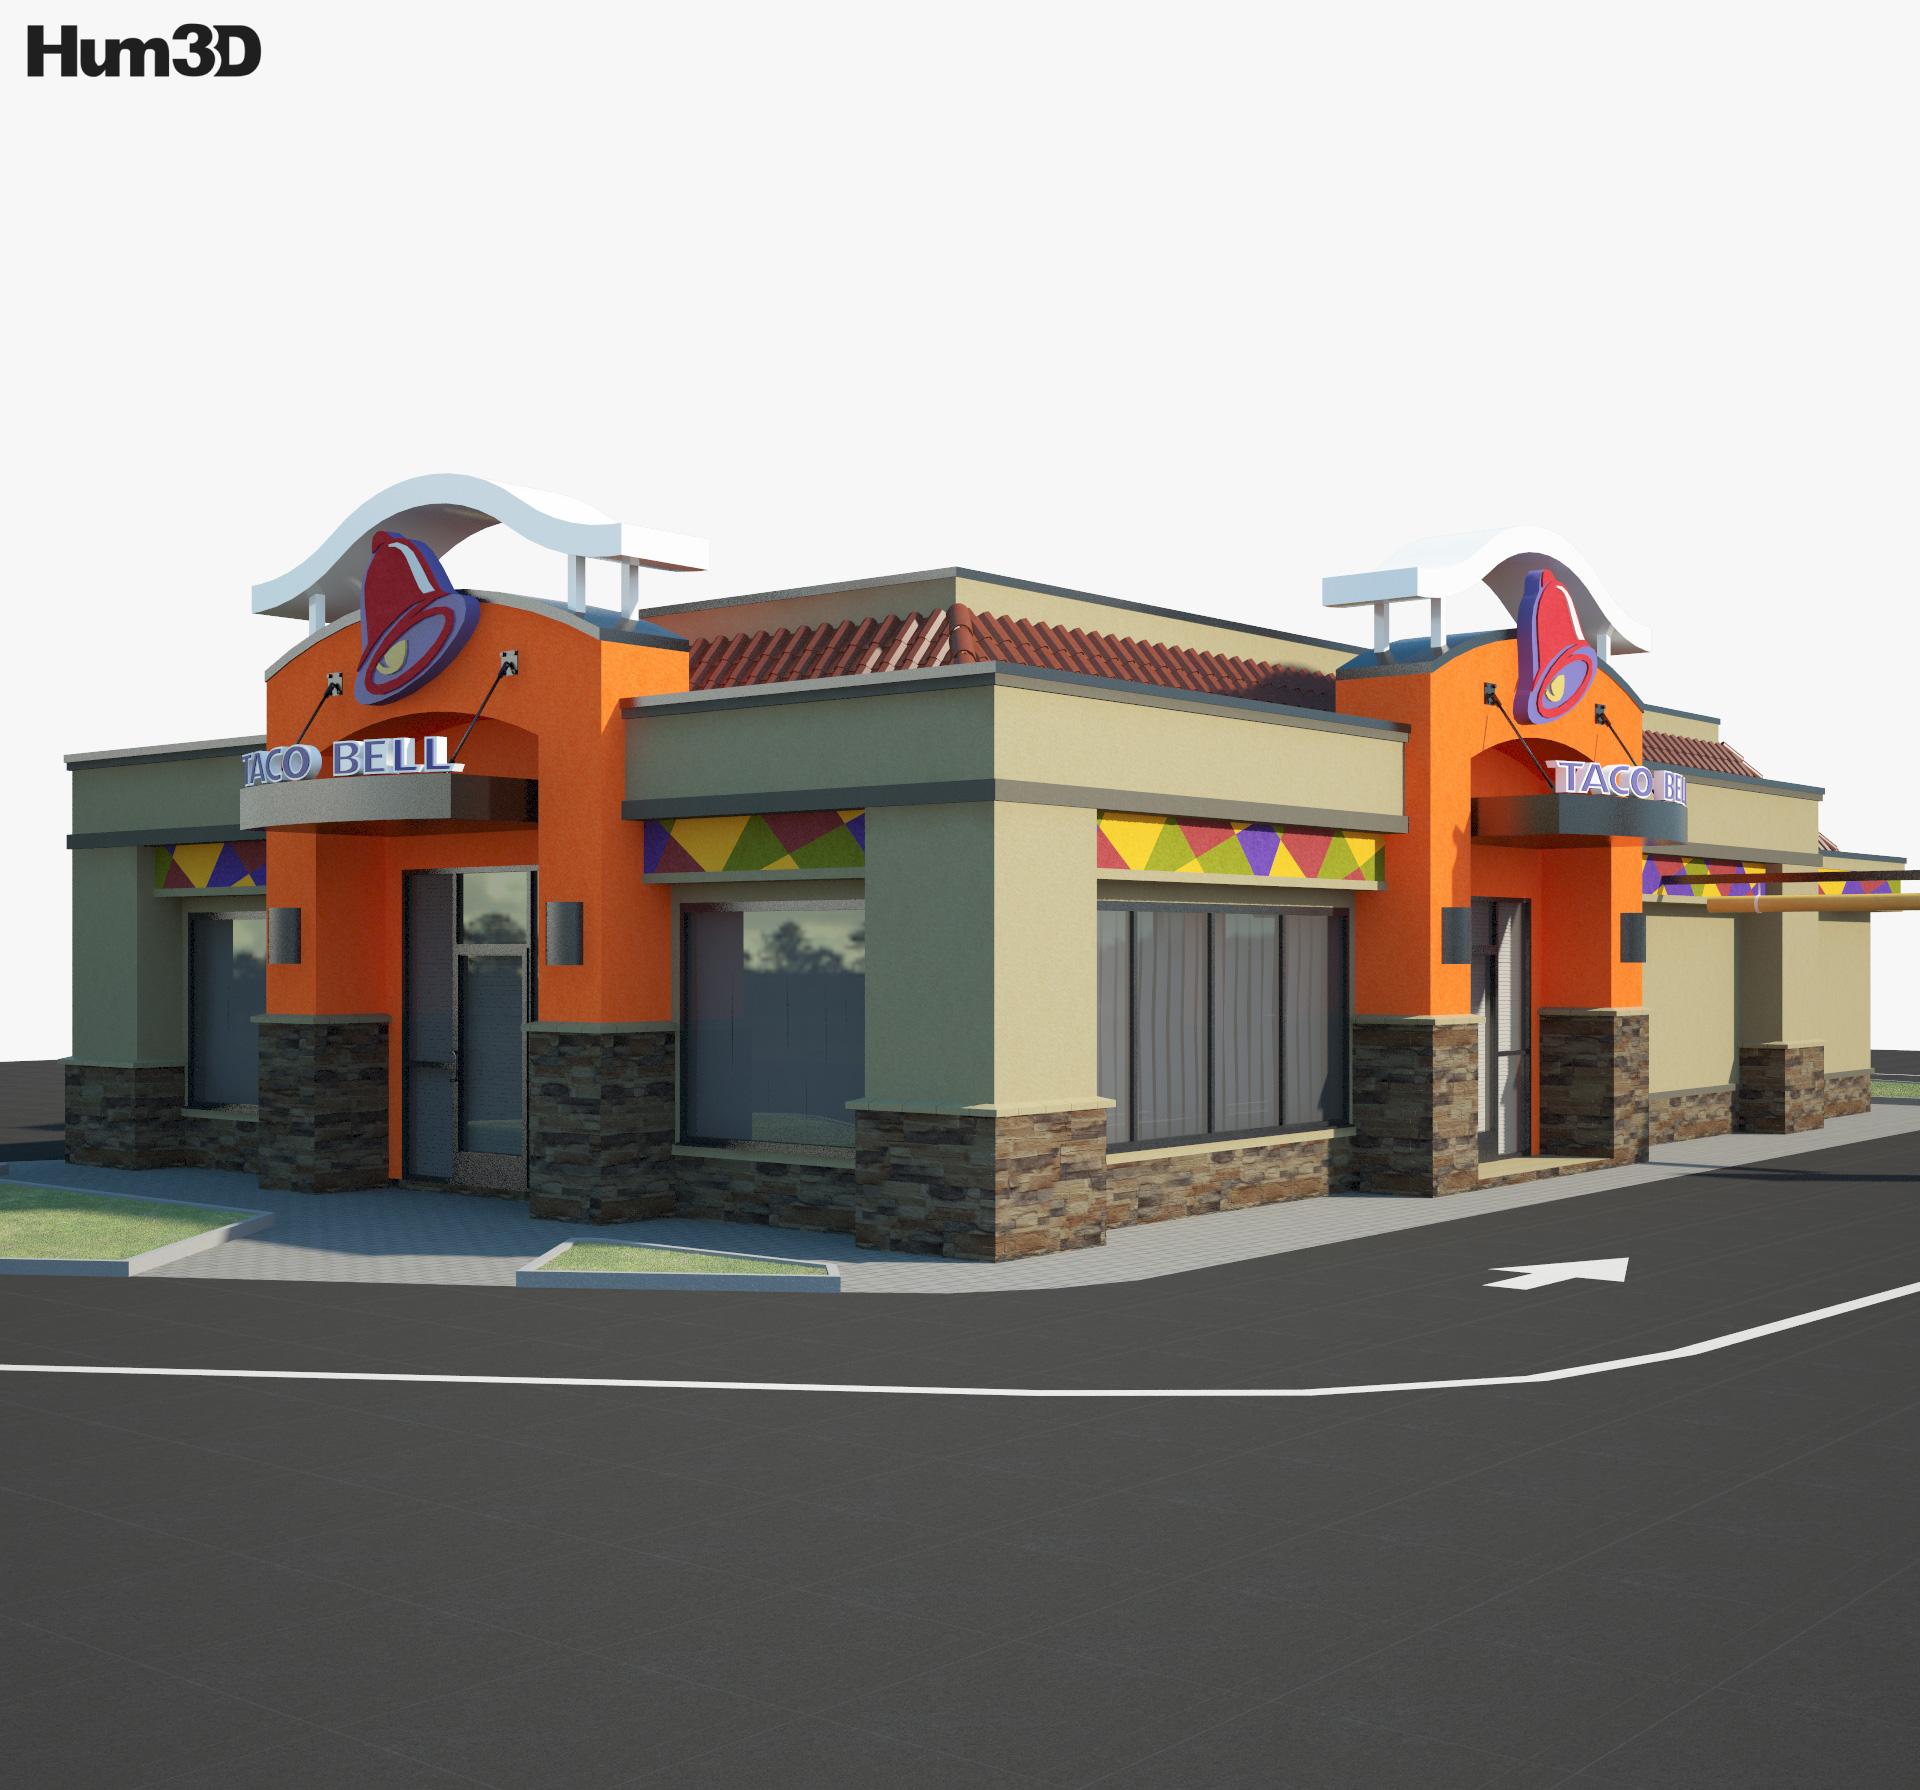 Taco Bell Restaurant 02 3d model